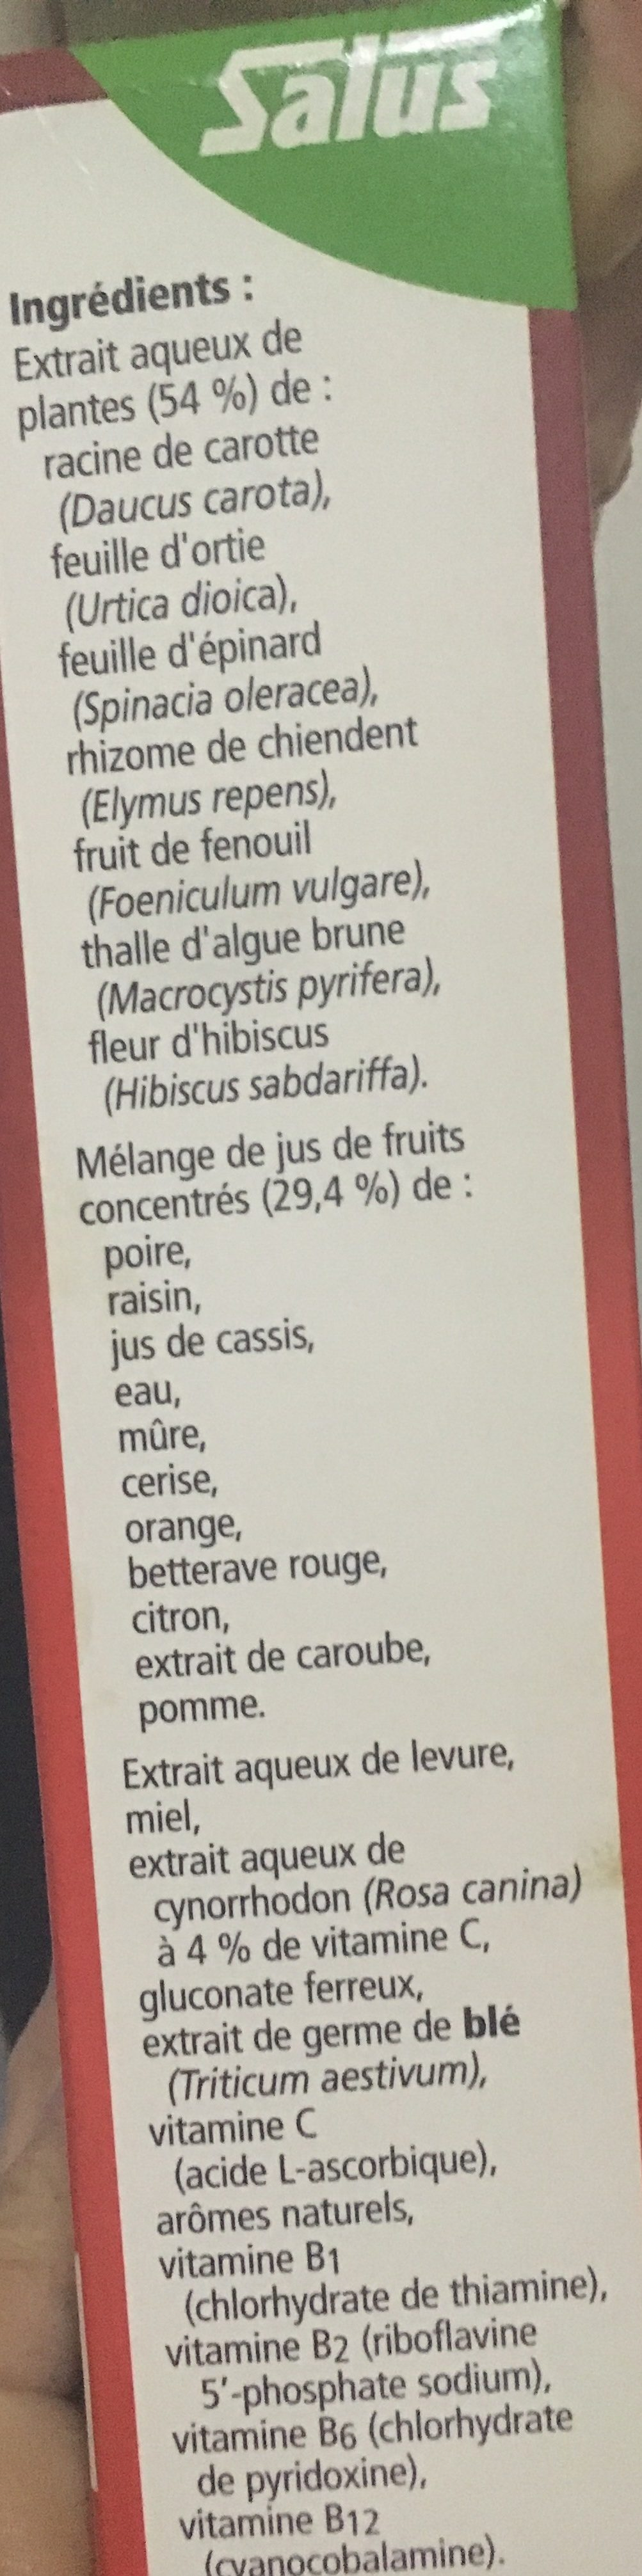 Floradix Fer + Plantes - 250 ML - Salus - Ingredients - fr